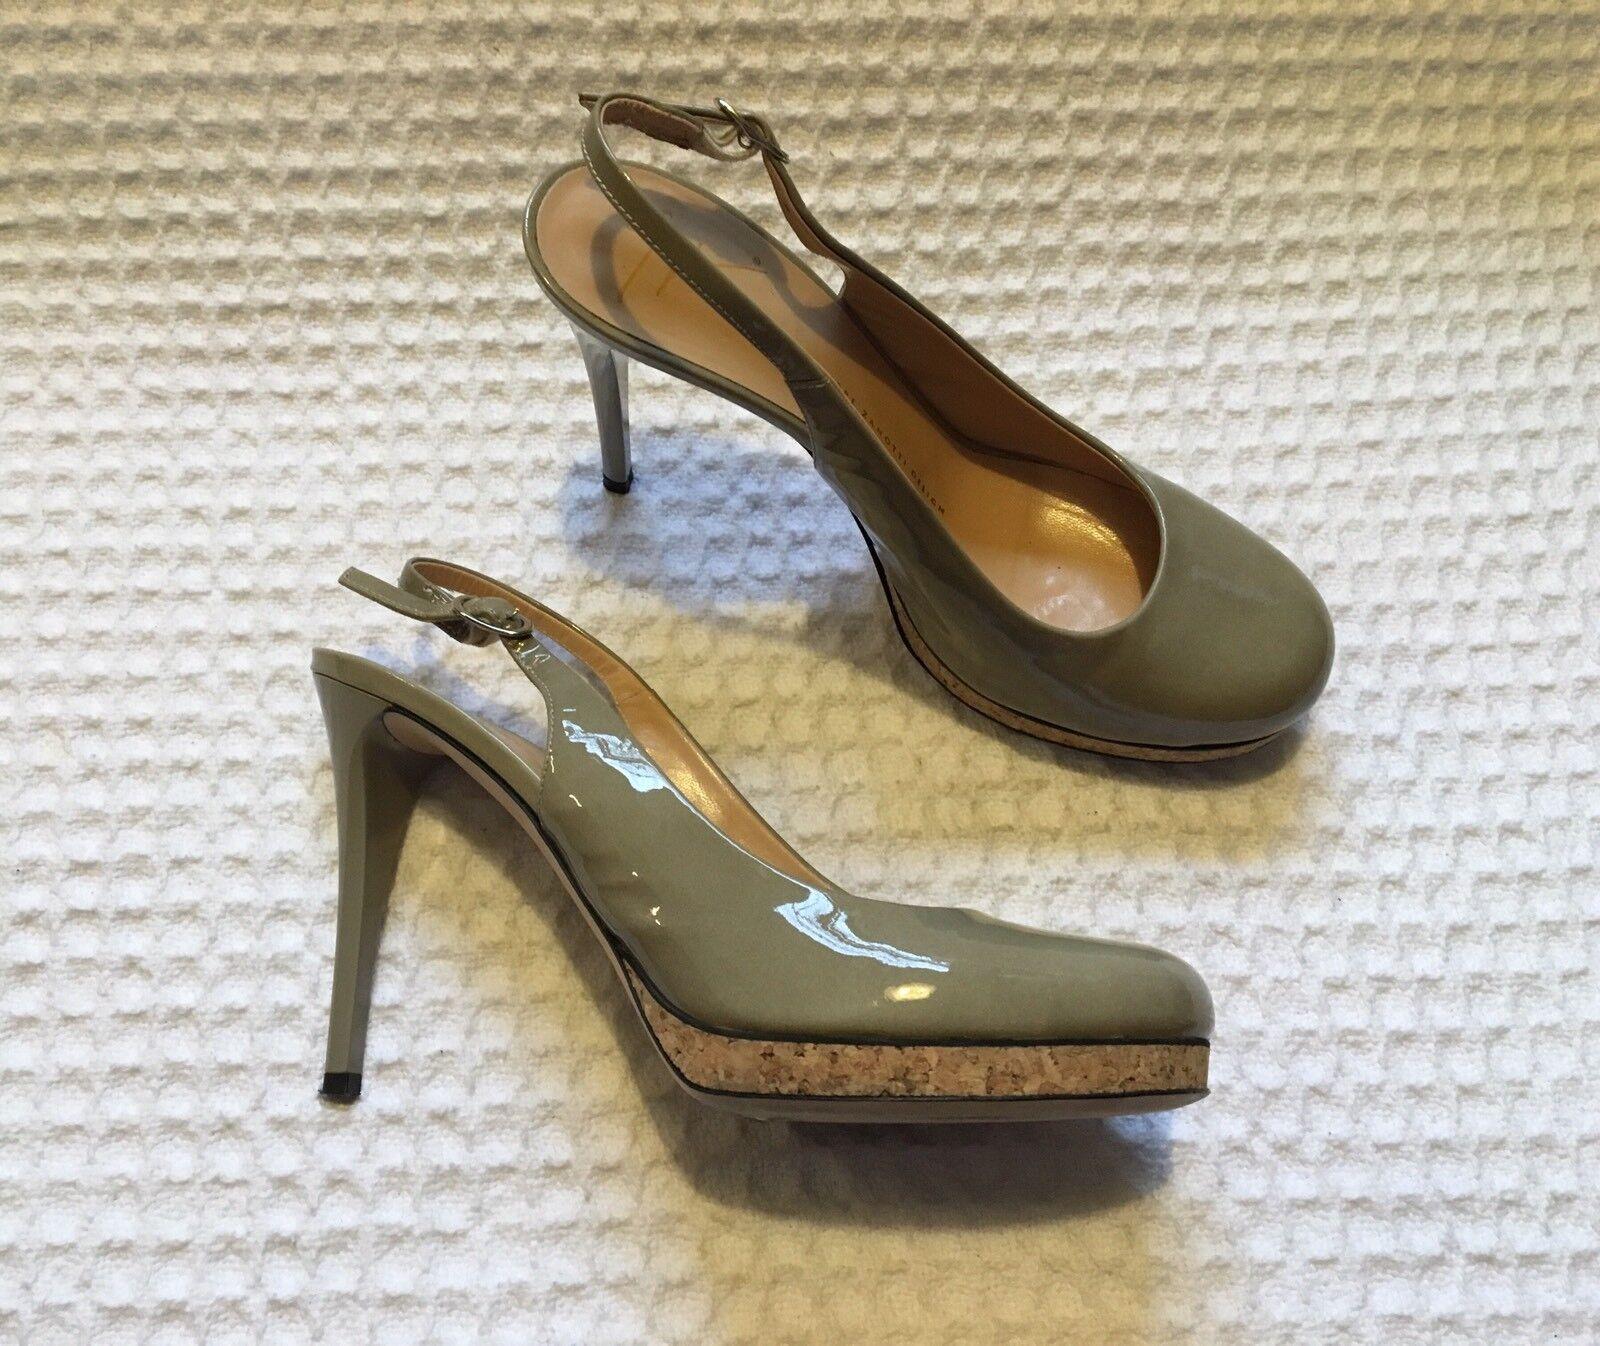 GIUSEPPE ZANOTTI Sminny 90 Patent Leather High Heels Slingback Sandals 38 8 Nude